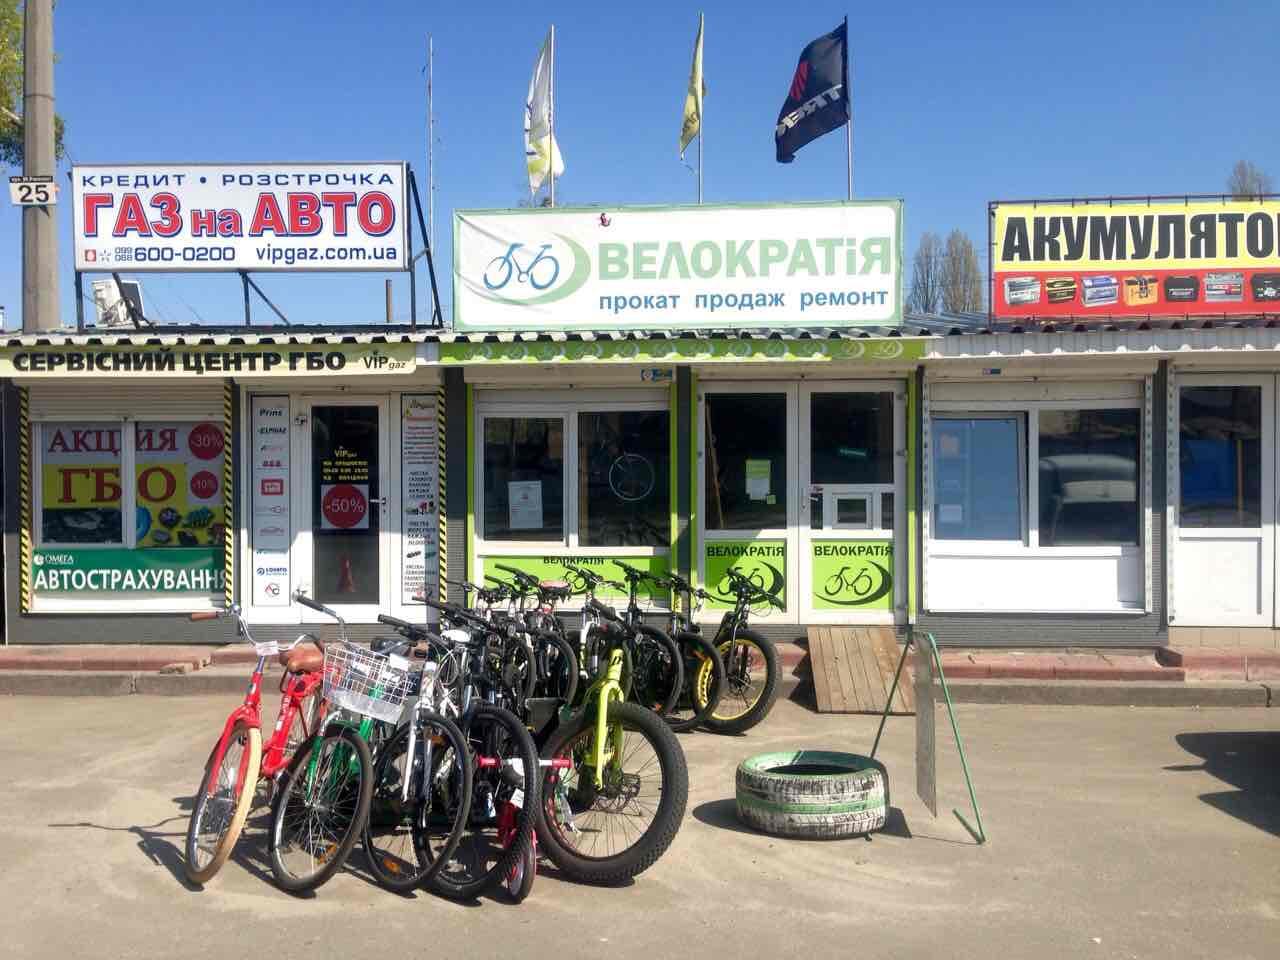 Велократ - прокат велосипедов на Левобережке, станция метро Левобережная